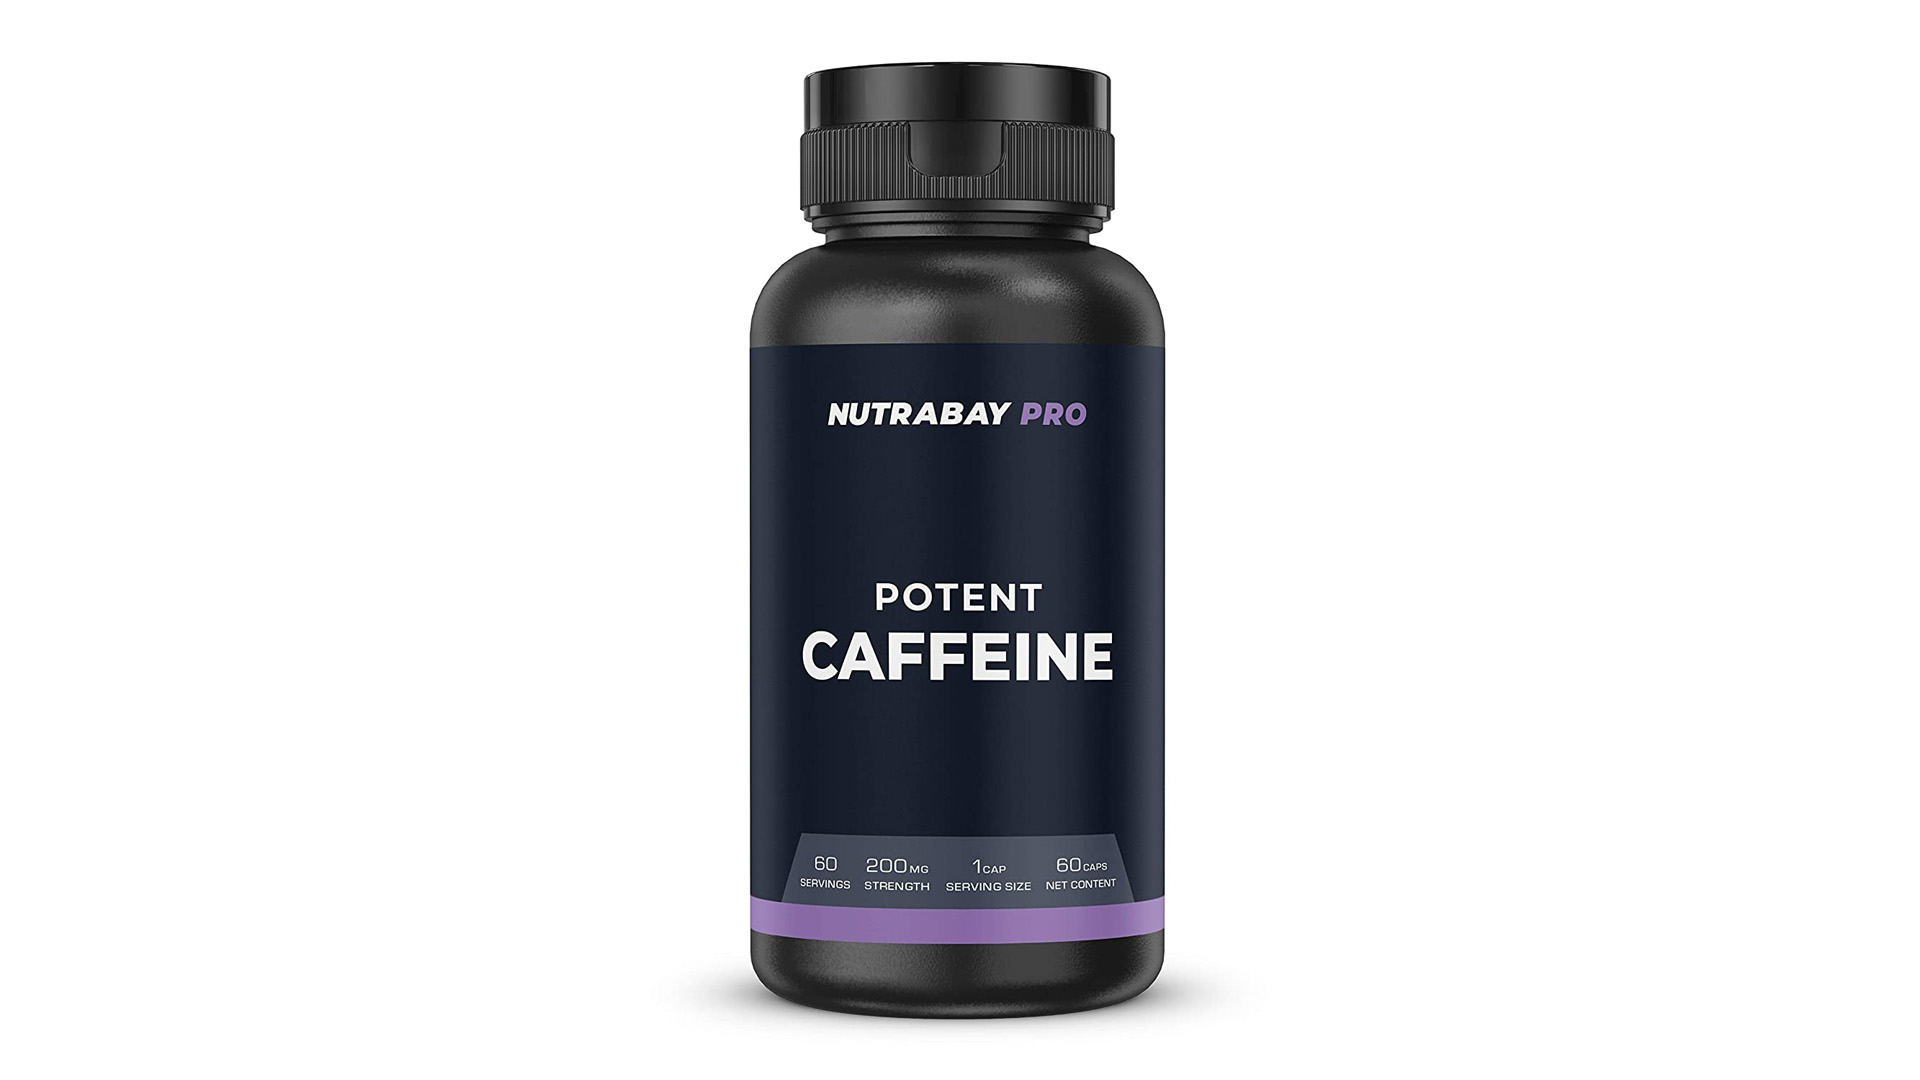 Nutrabay Pro Caffeine